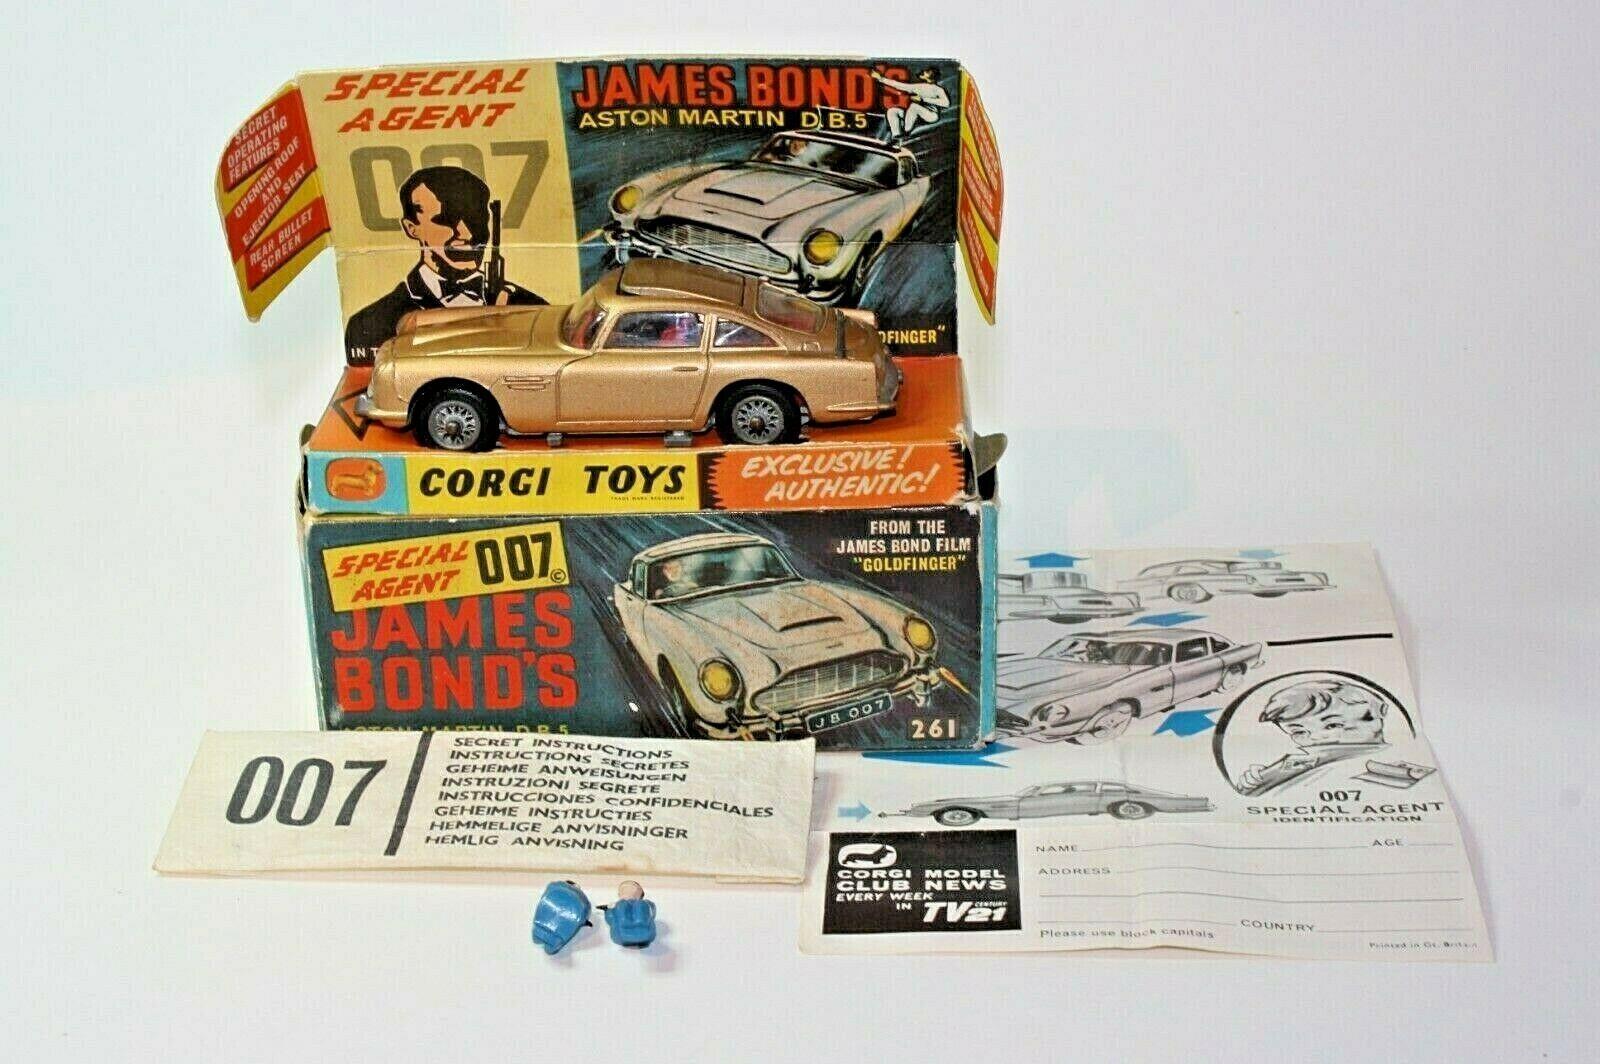 Corgi 261 James Bond Aston Martin, Very Good Condition, Excellent Original Box